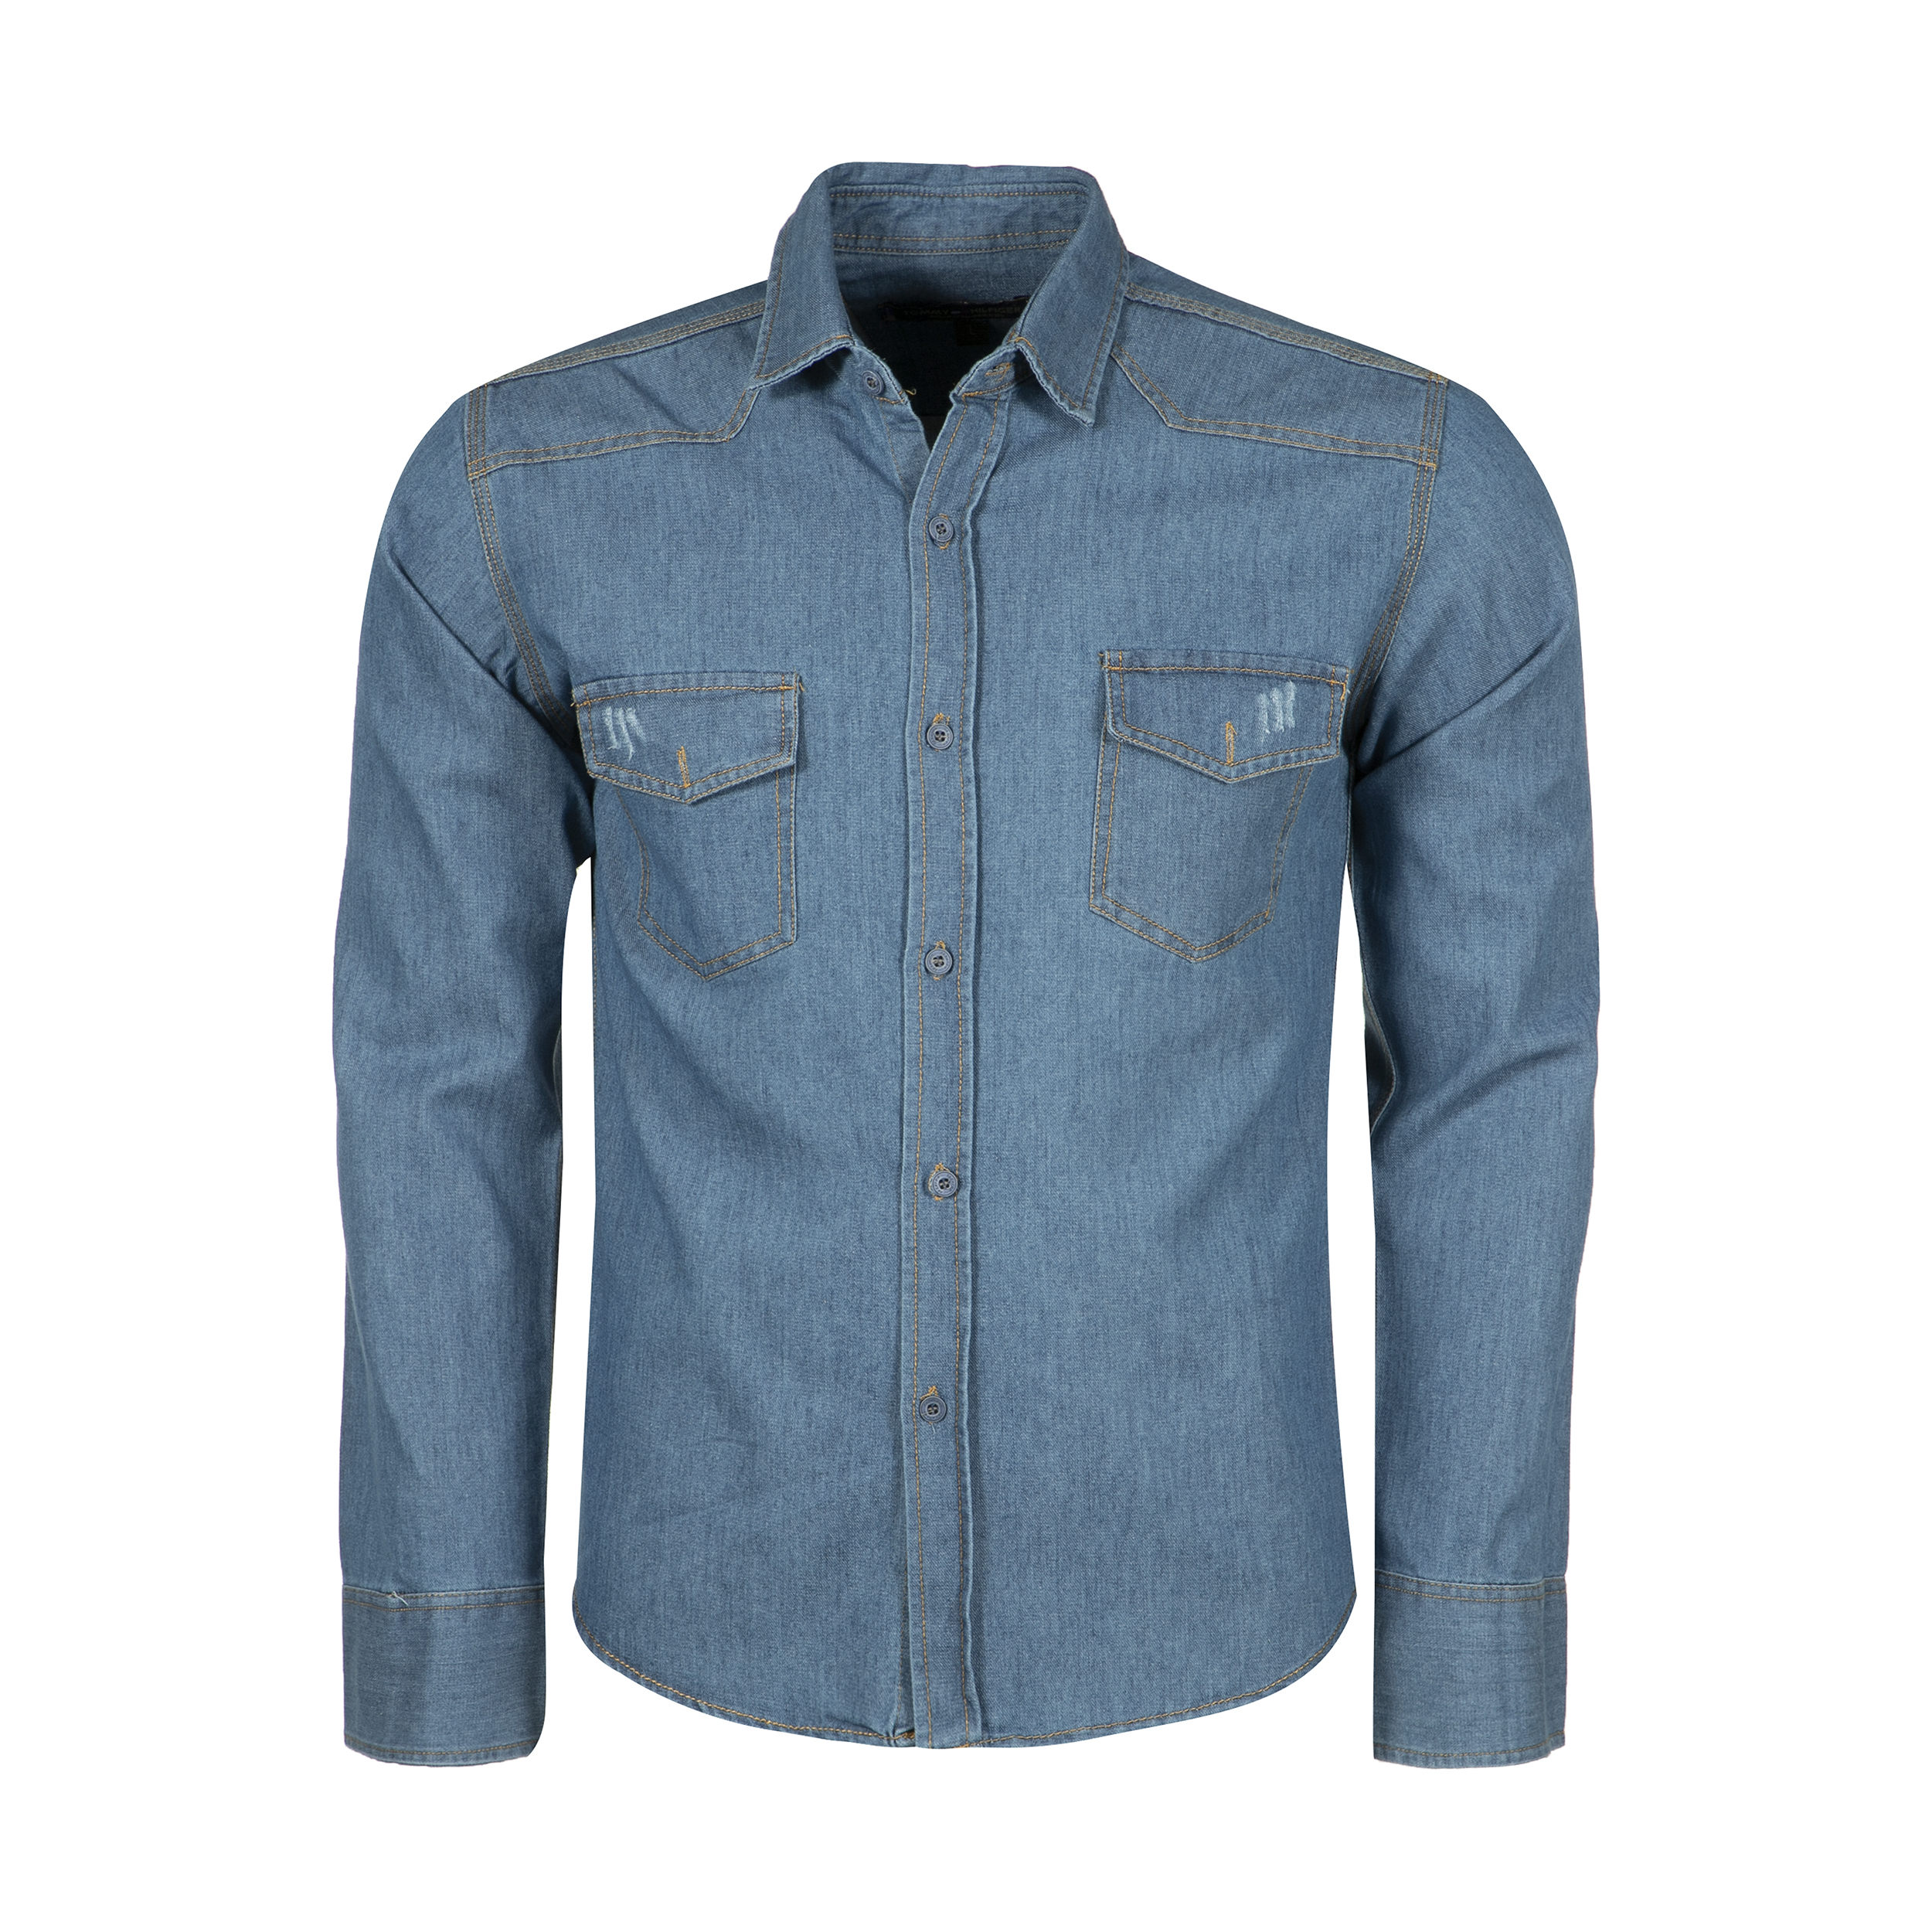 پیراهن مردانه کد M02311